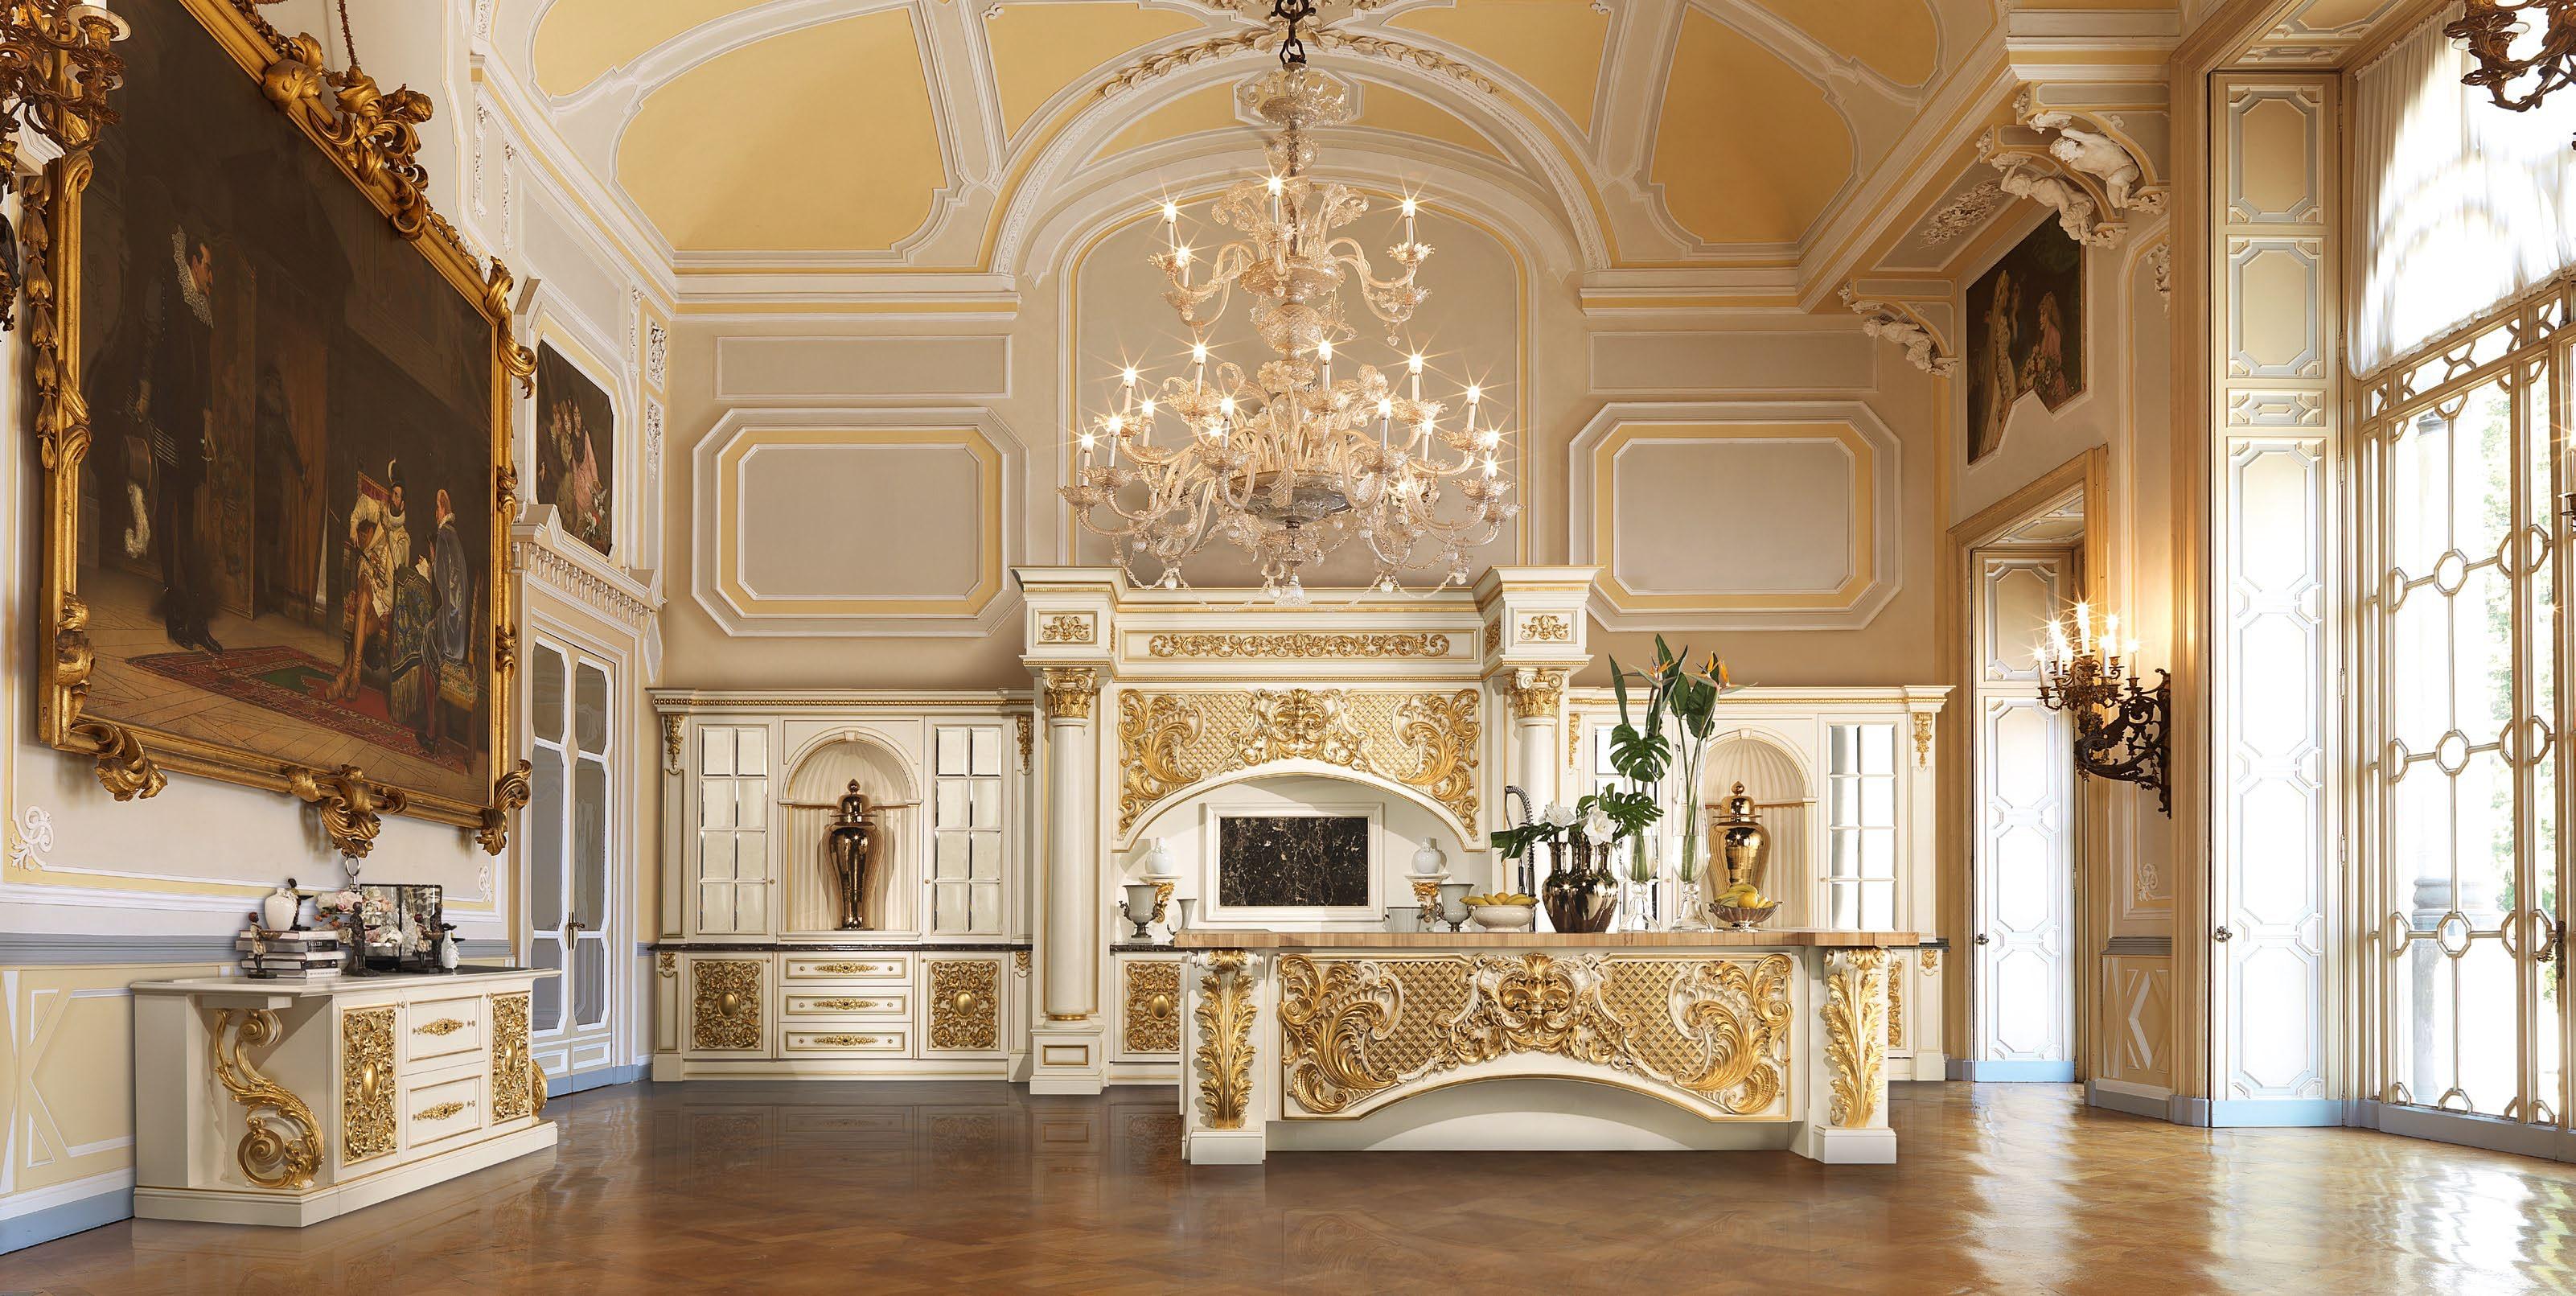 Palazzo Giada